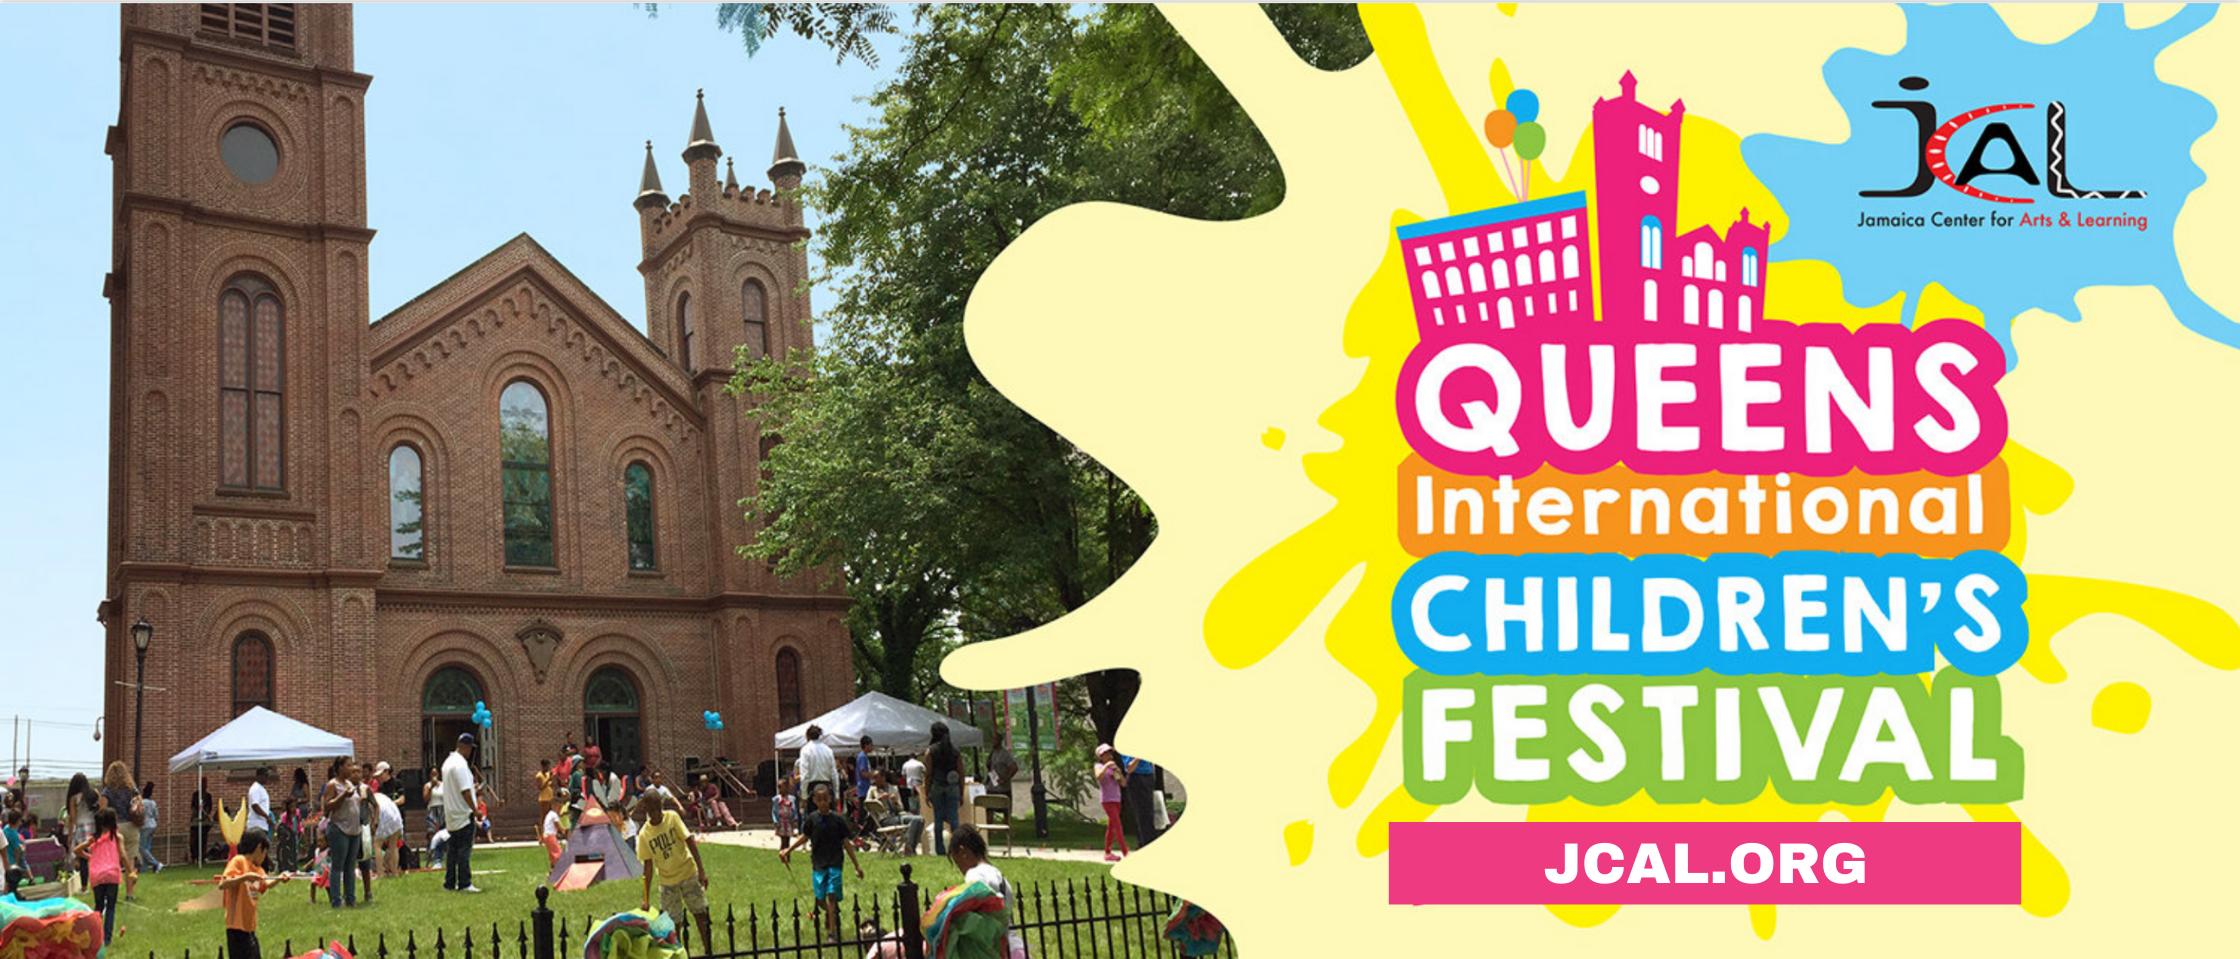 Queens International Childrens Festival at Jamaica Performing Arts Center